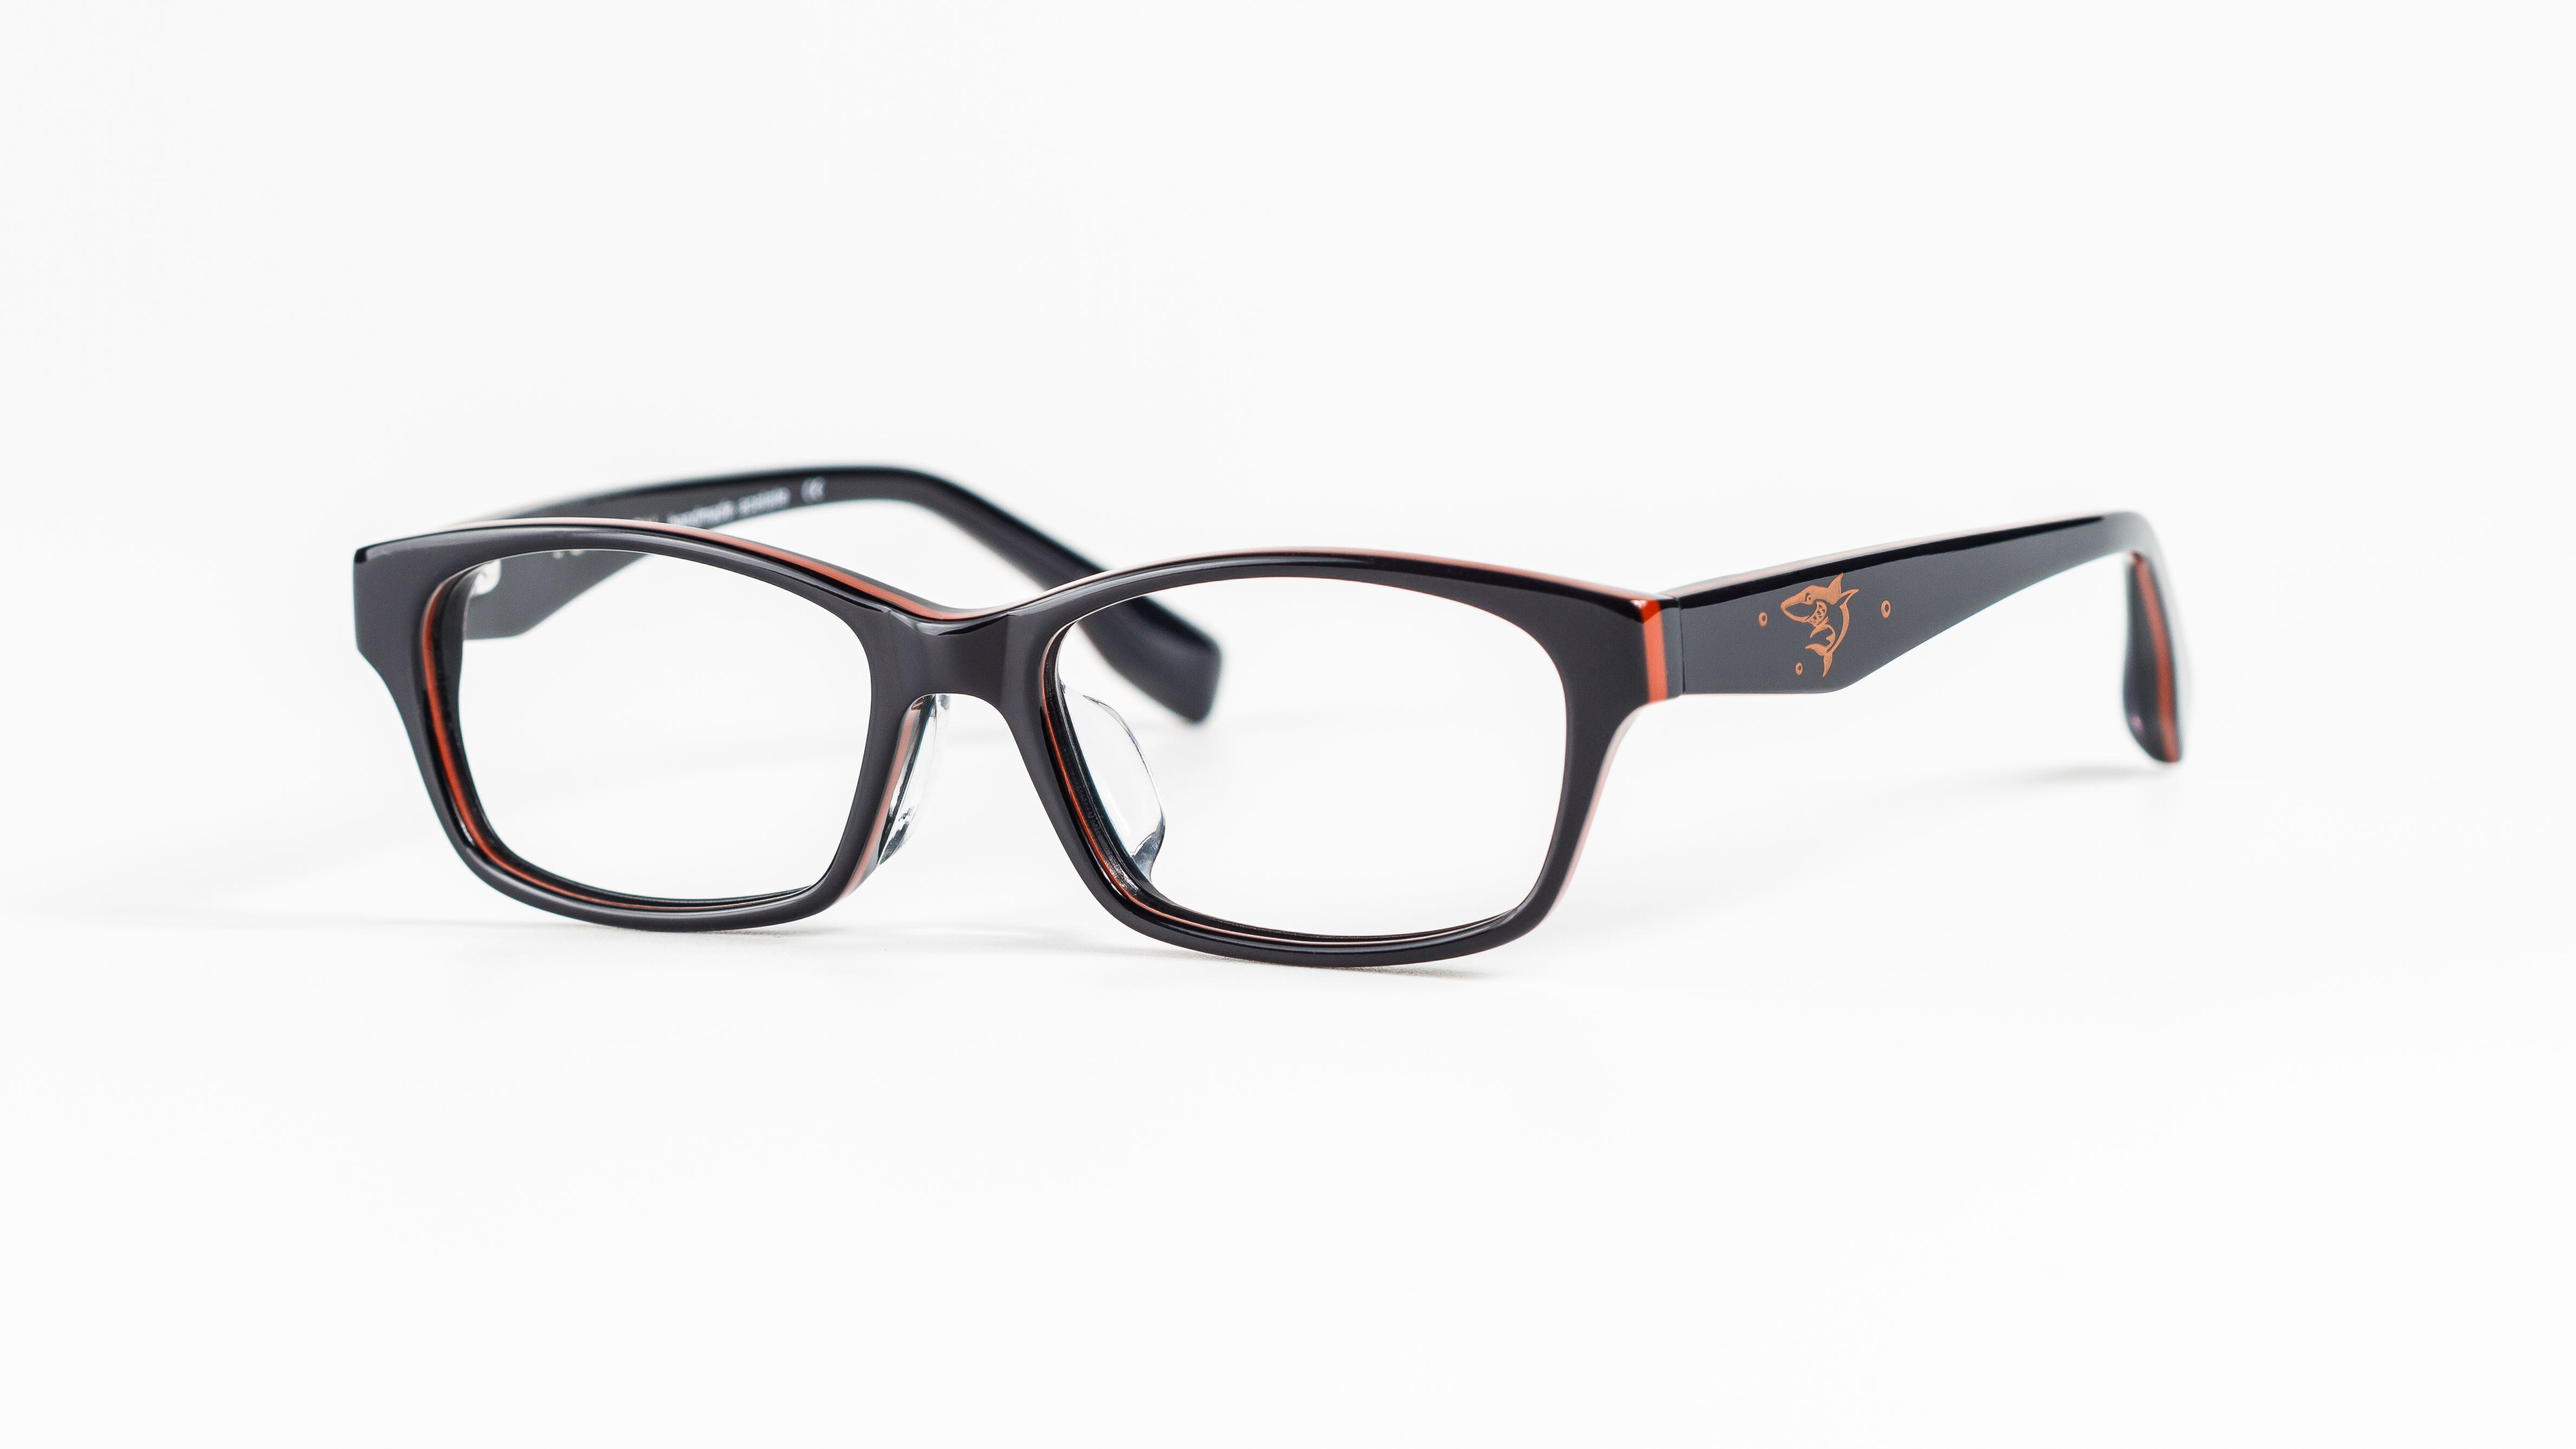 9942ec9a12 TC CHARTON Asian Fit Eyewear - Bruce Kids Frame